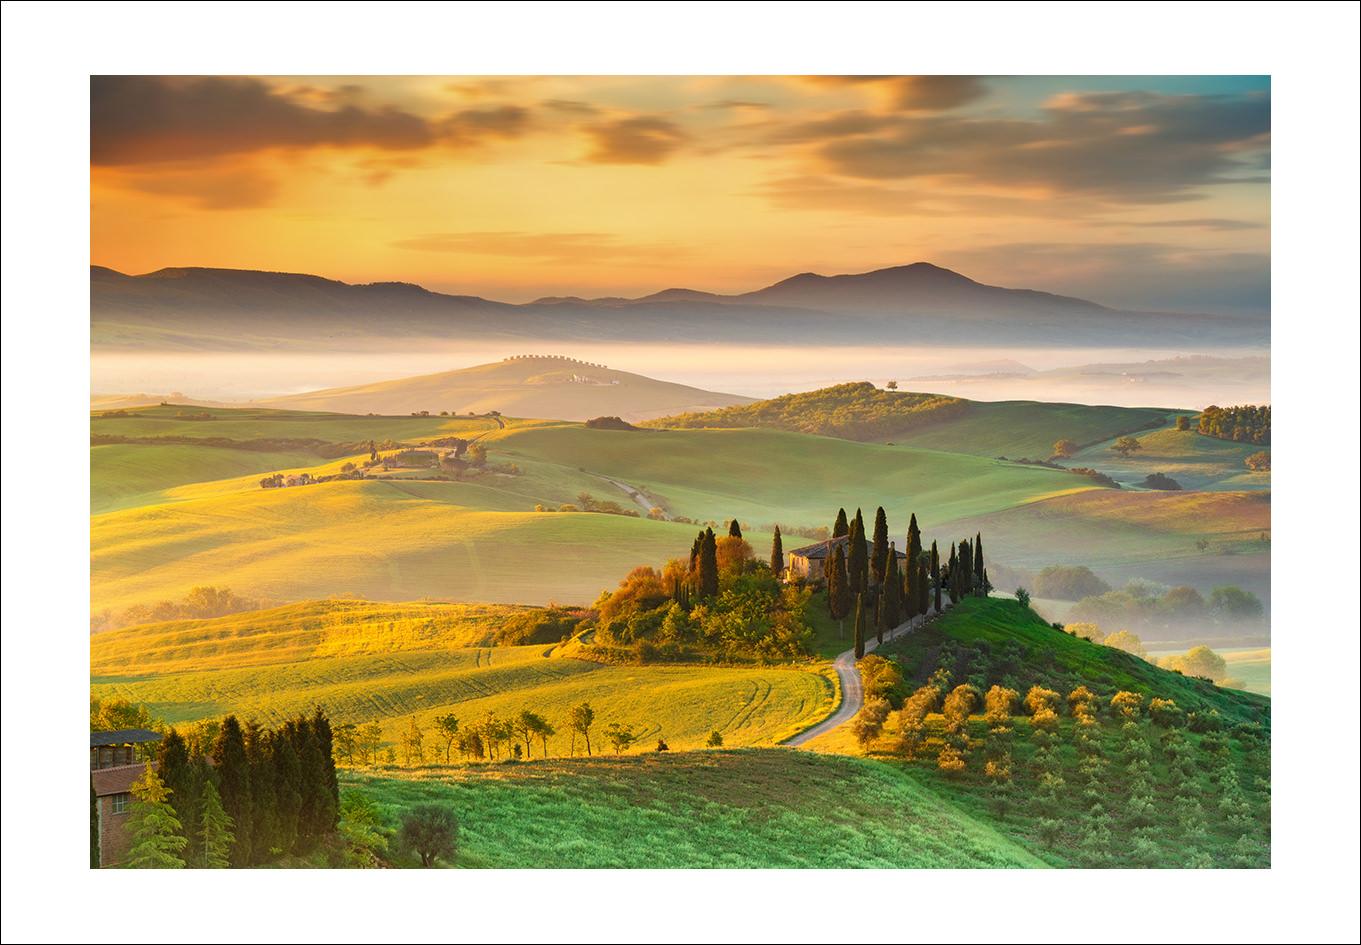 Tuscany photo for sale